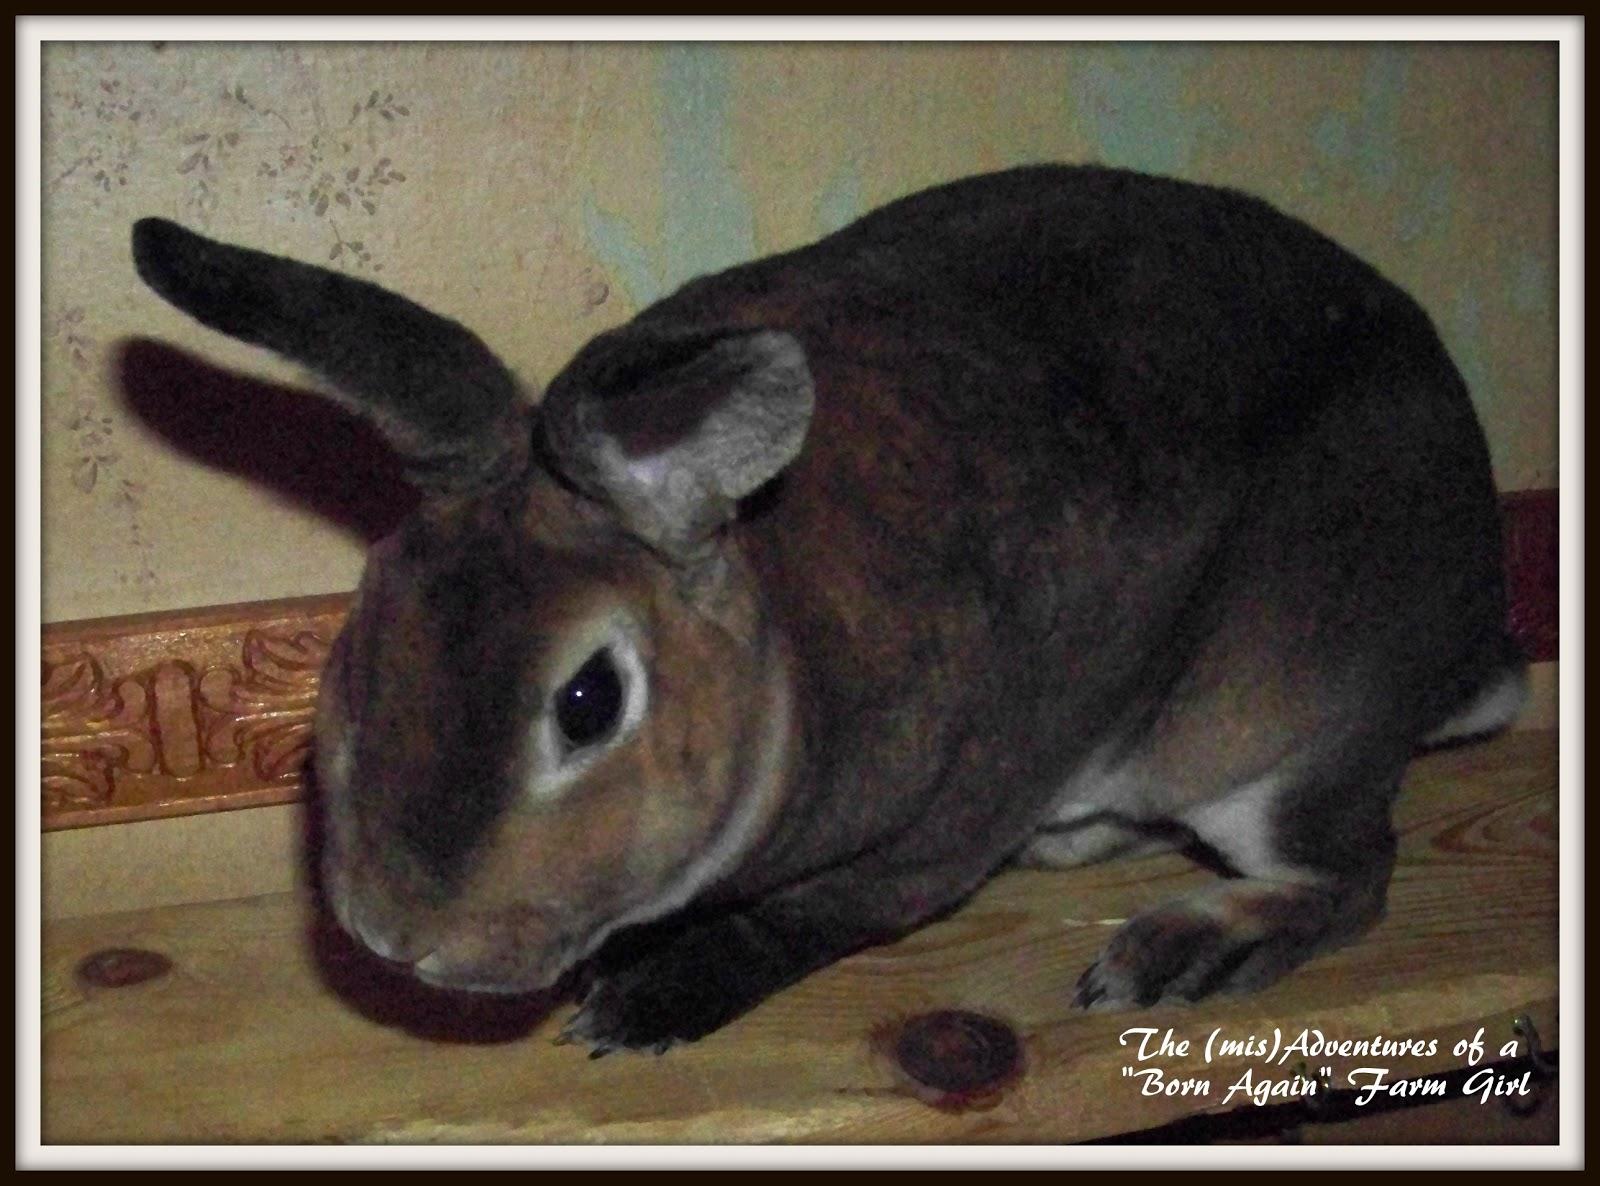 Visiting a rabbit show